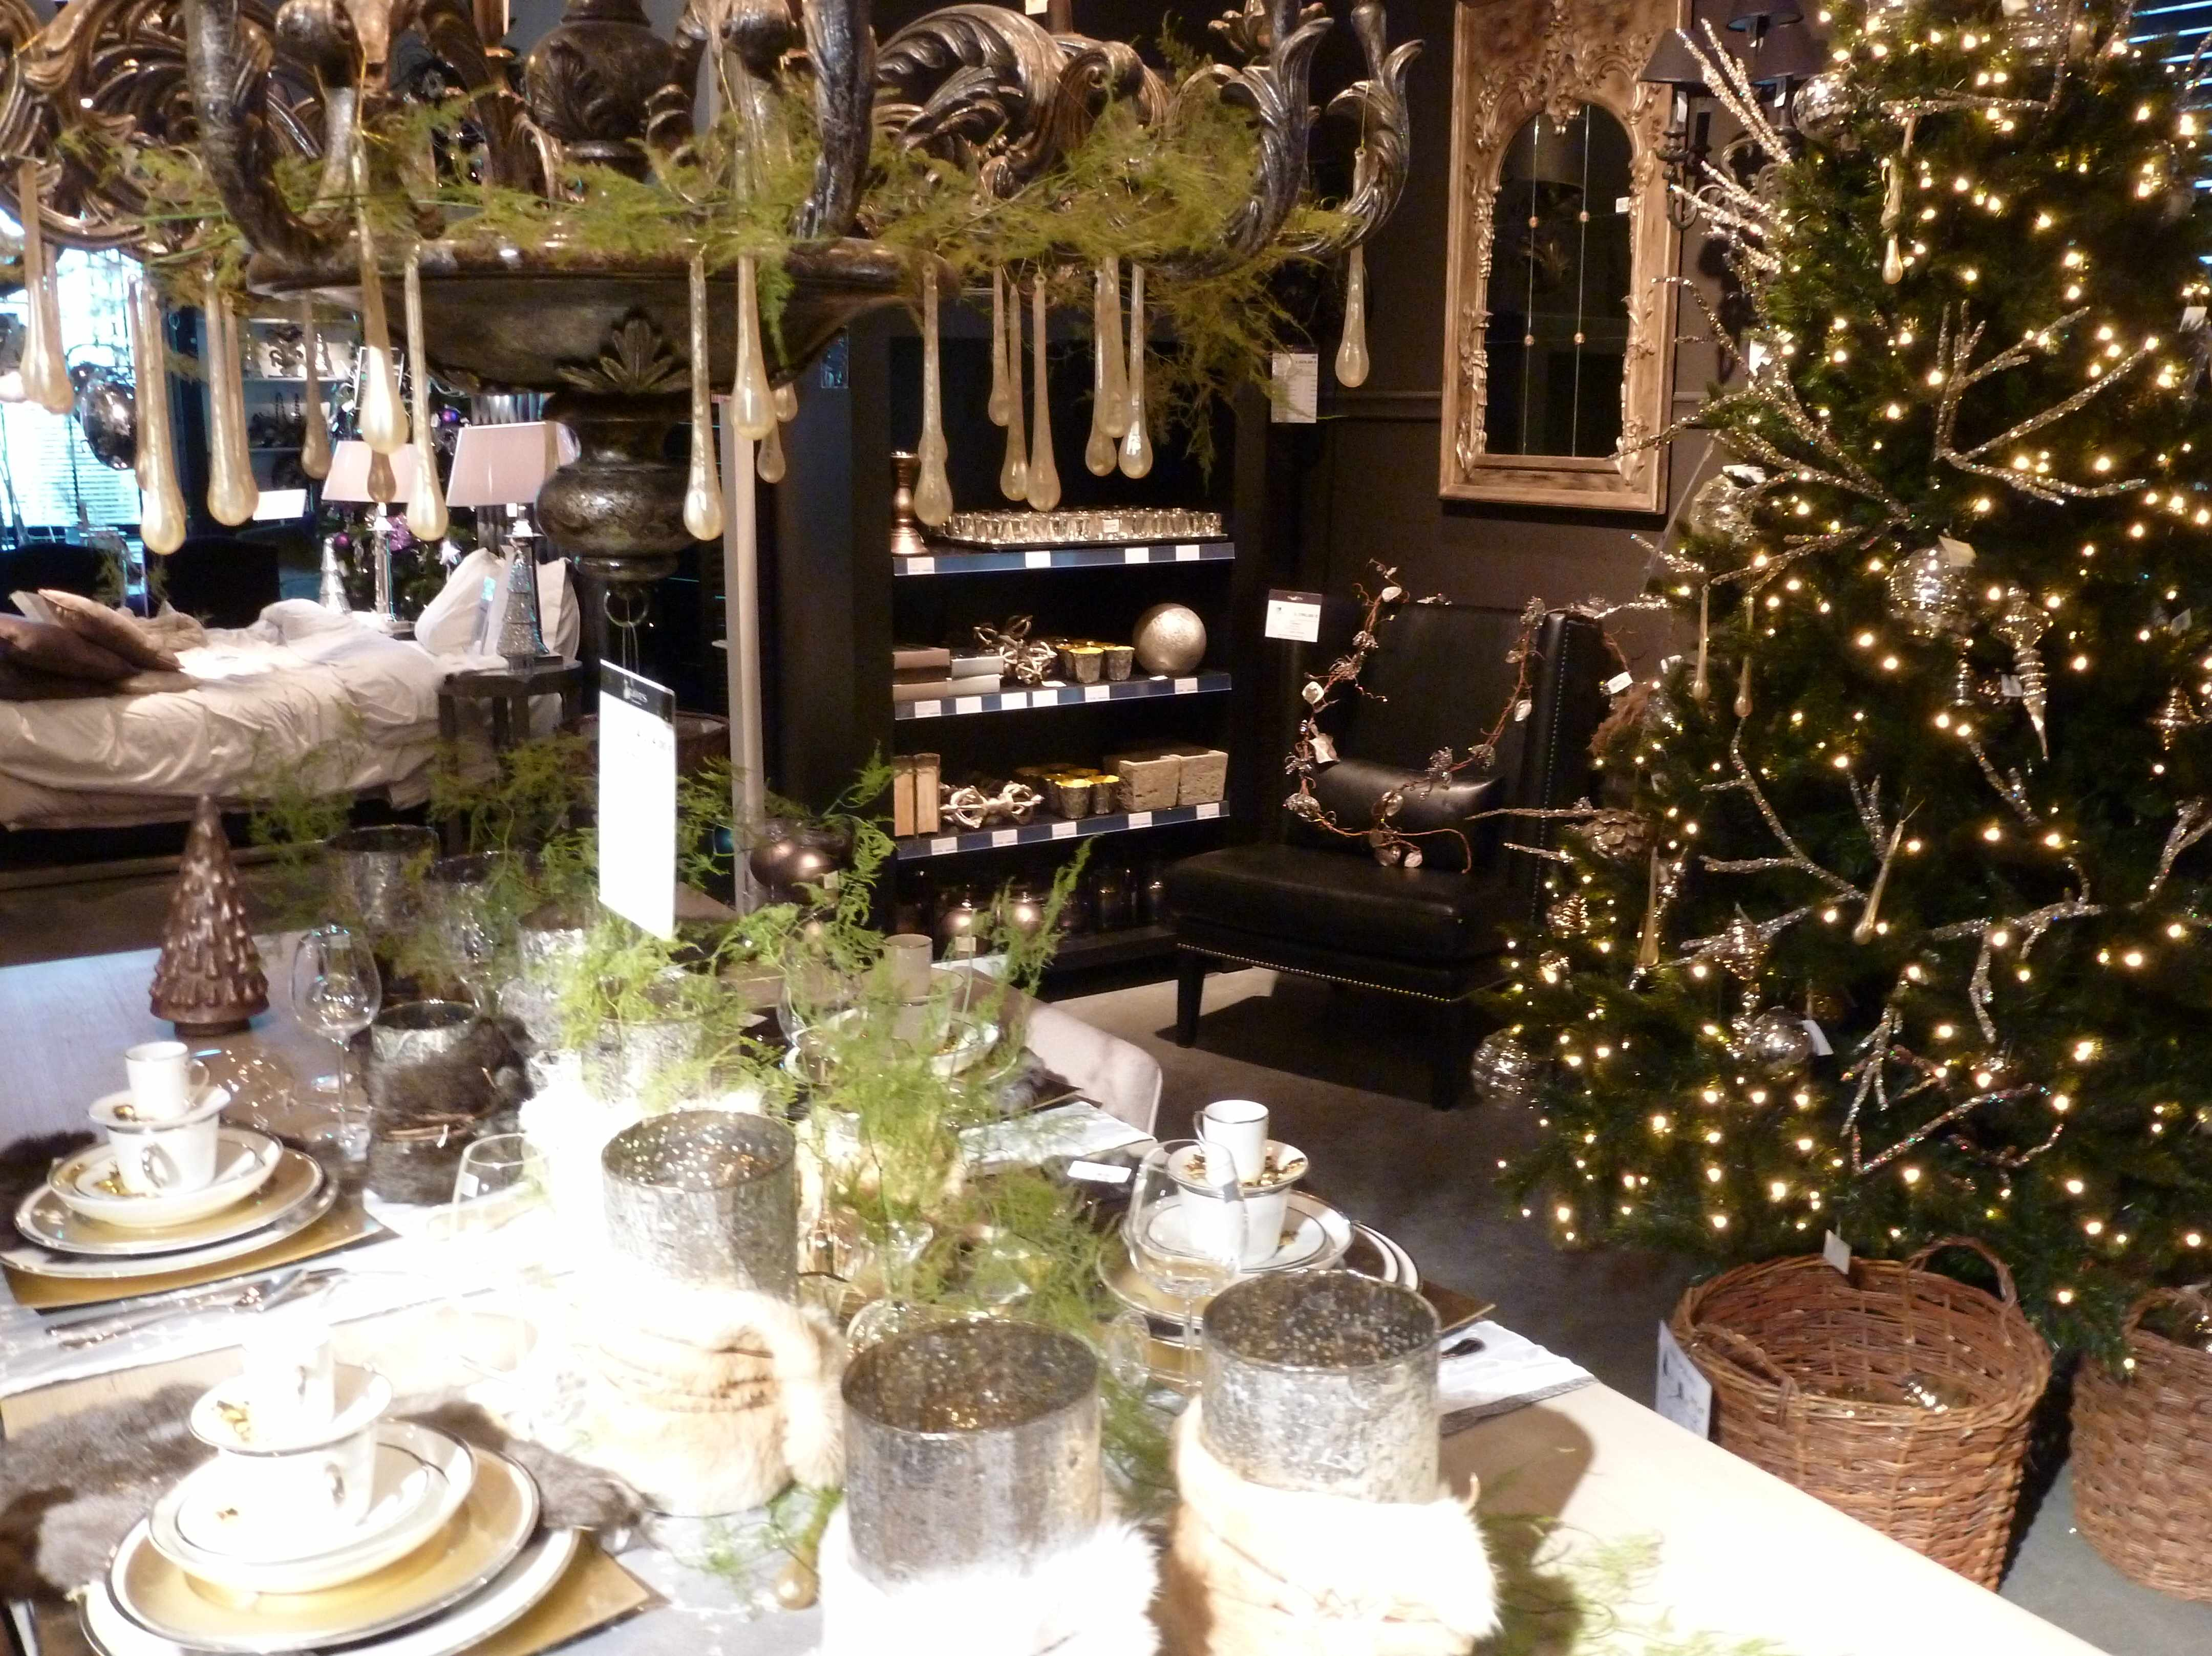 Ambiance Noel vert-or-fourrure Slots 12-2012